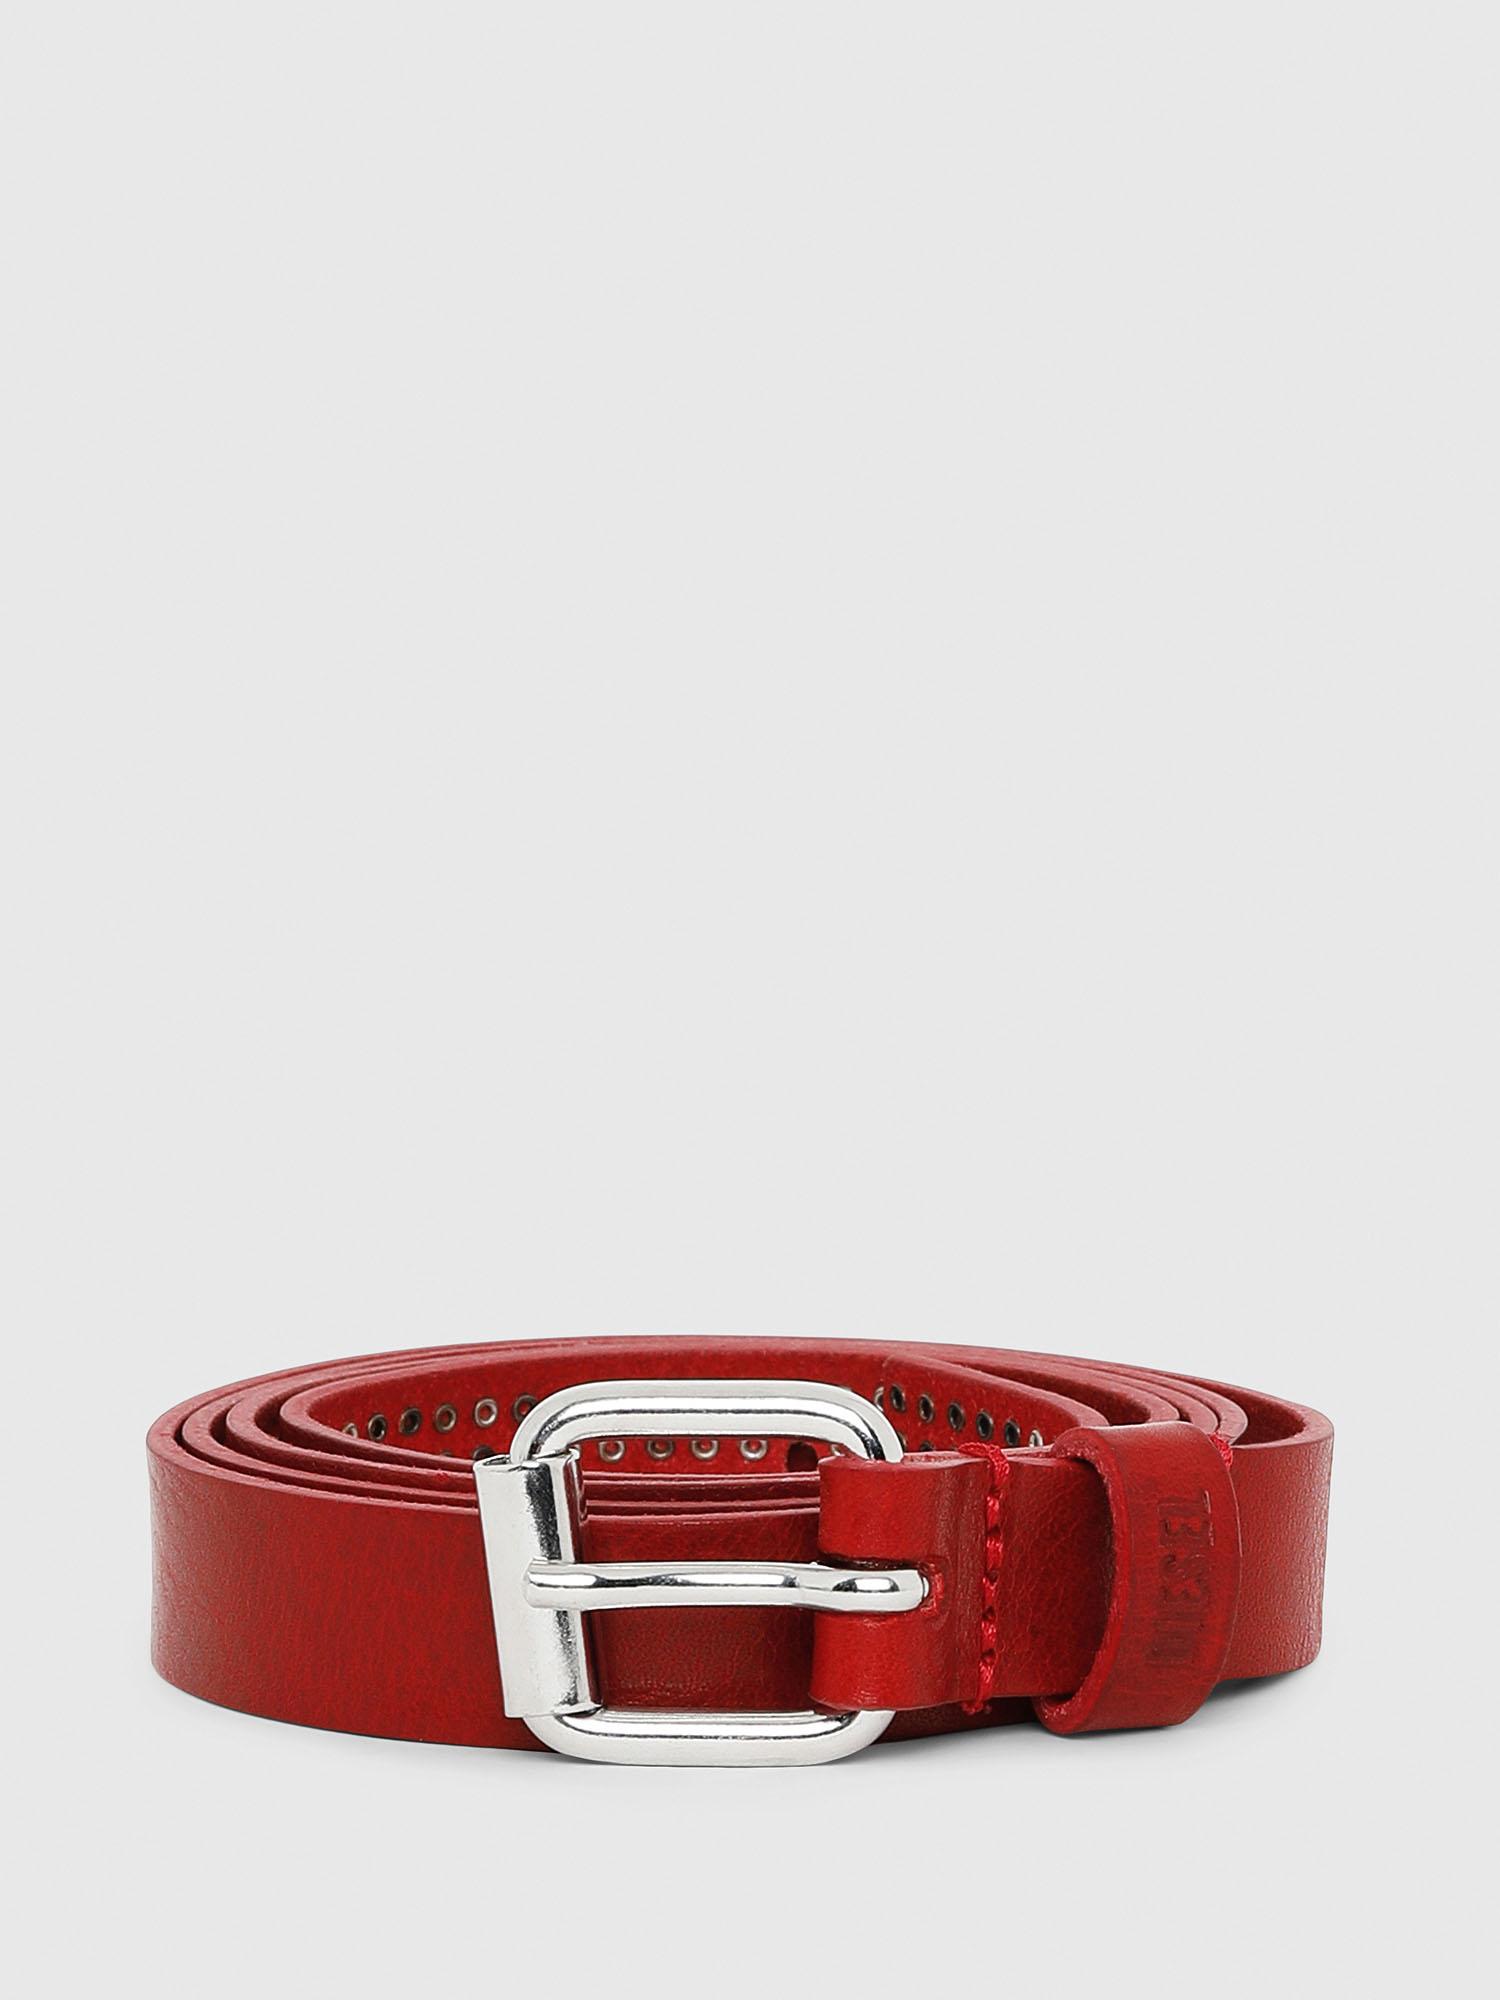 Diesel Belts P0752 - Red - 70